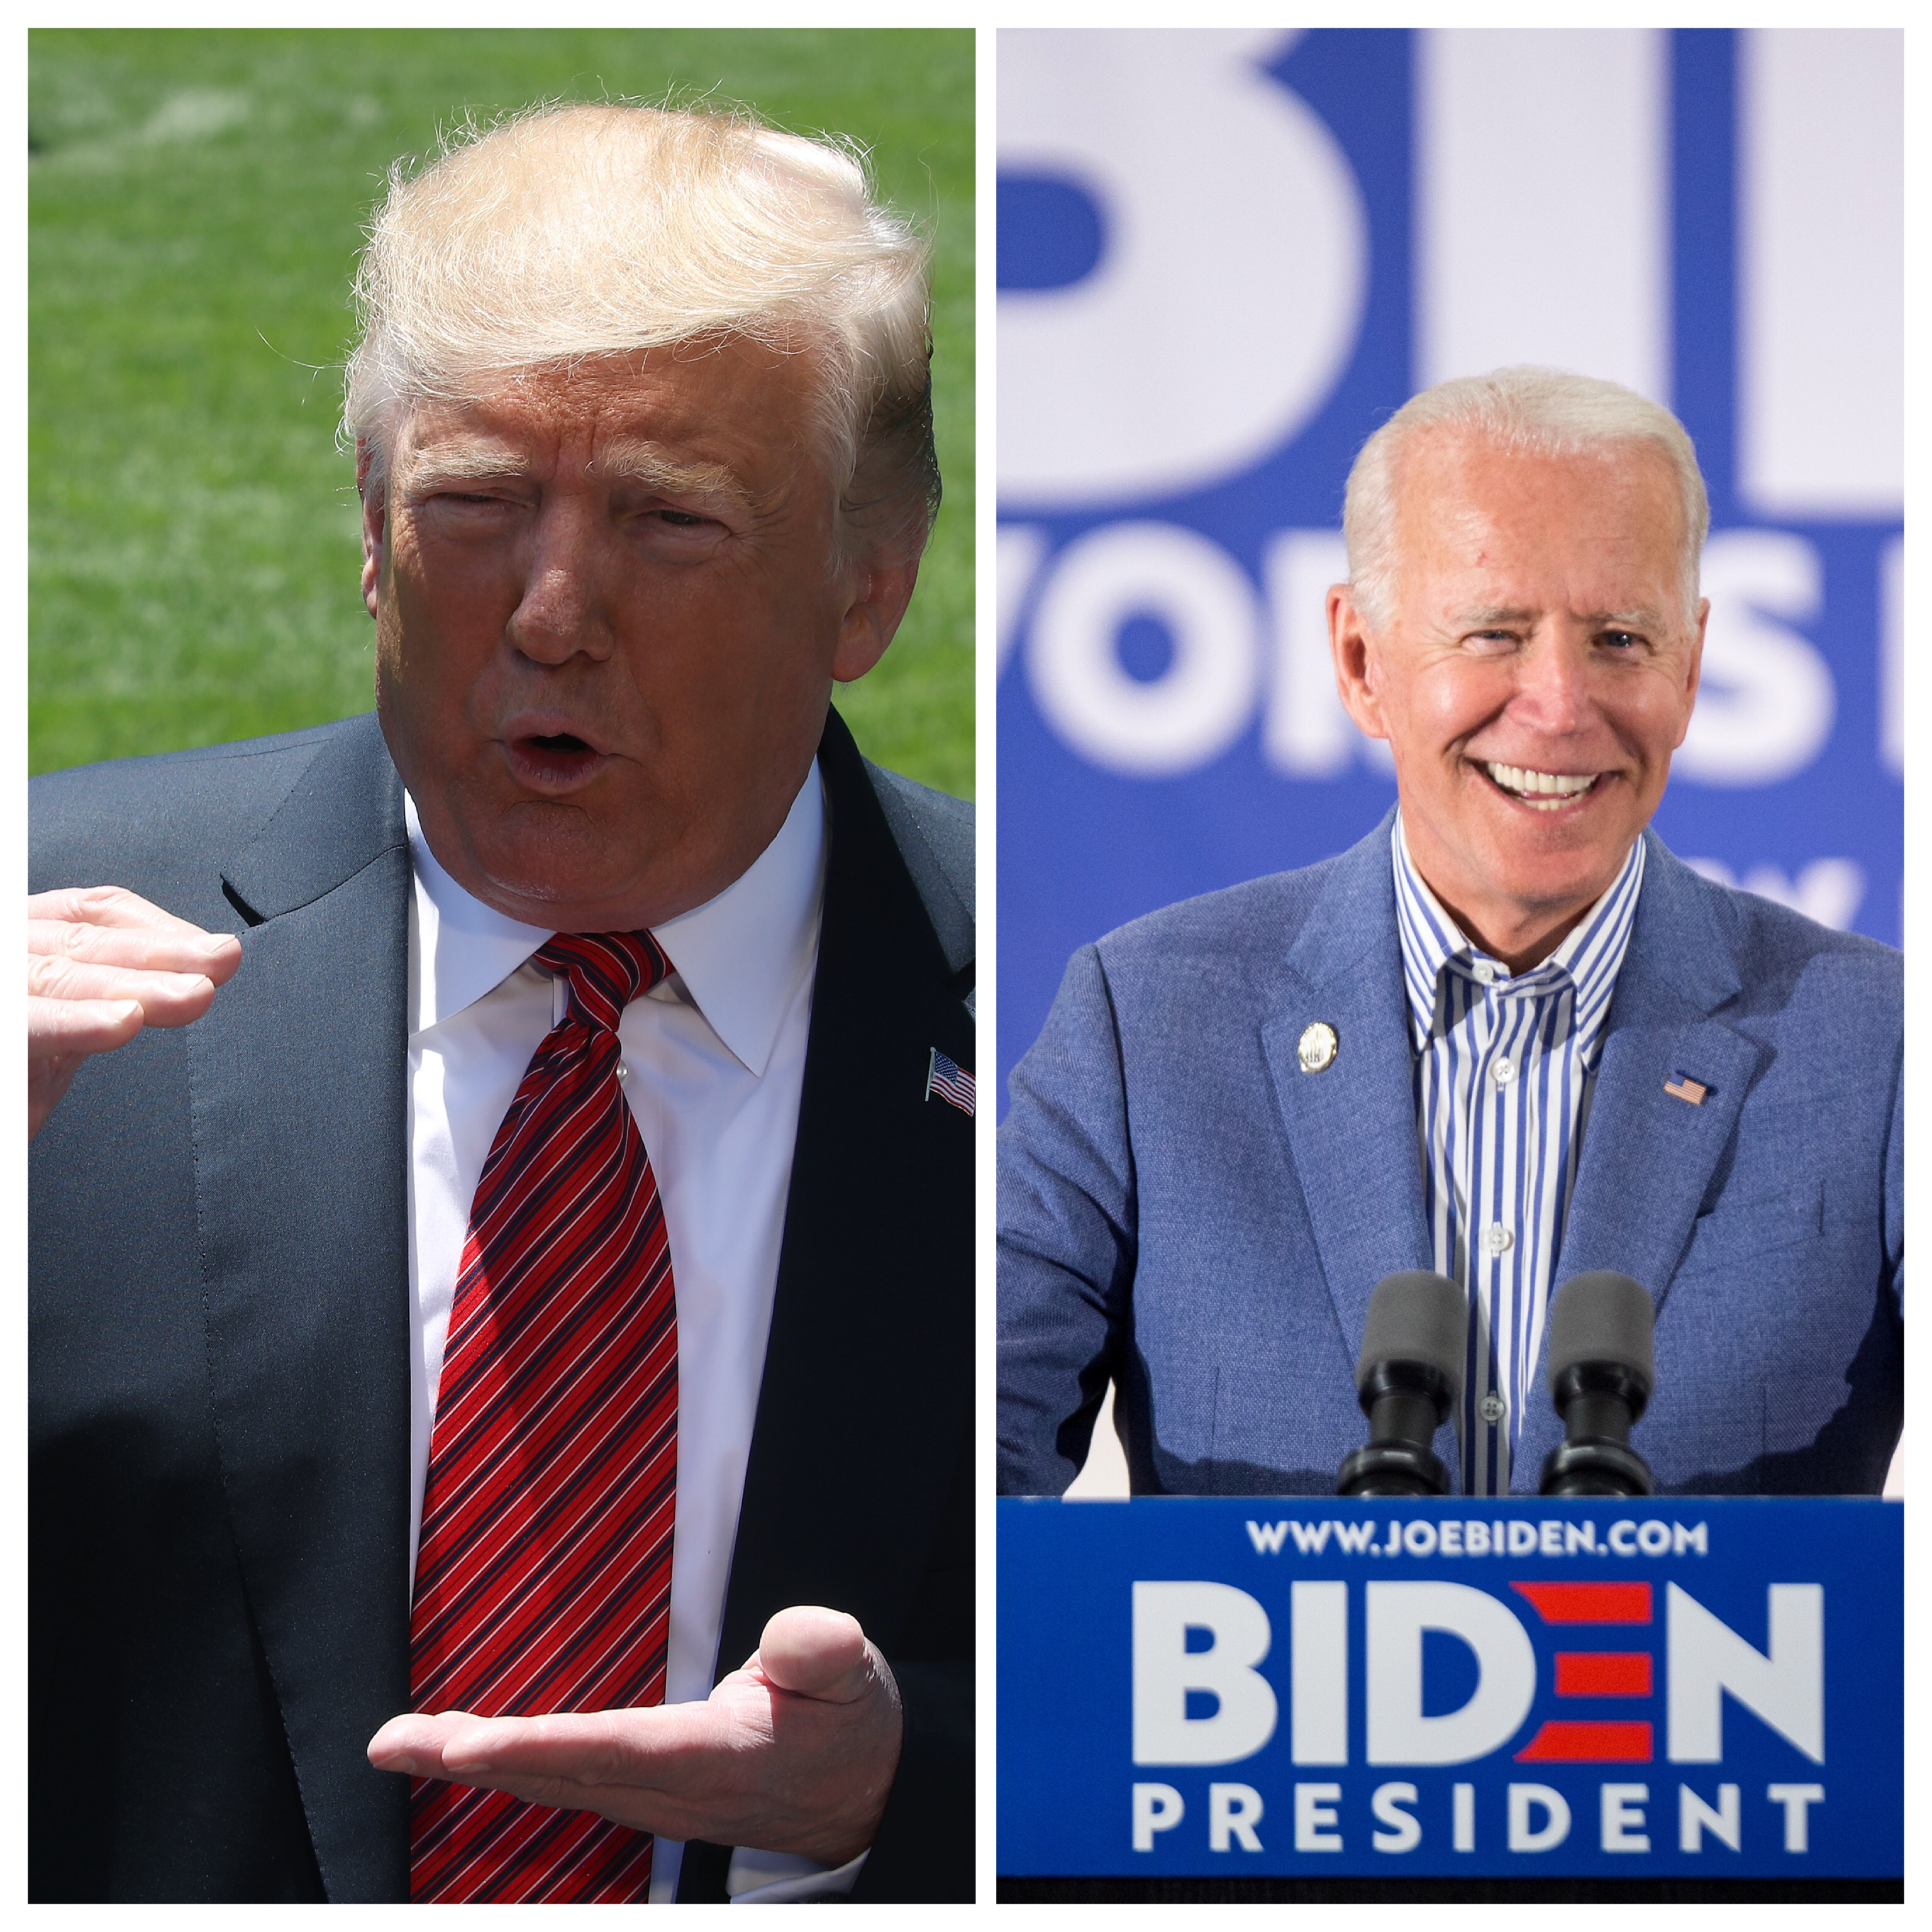 Trump Says He Wants To Run Against Joe Biden In 2020, Says He's The 'Weakest Mentally'